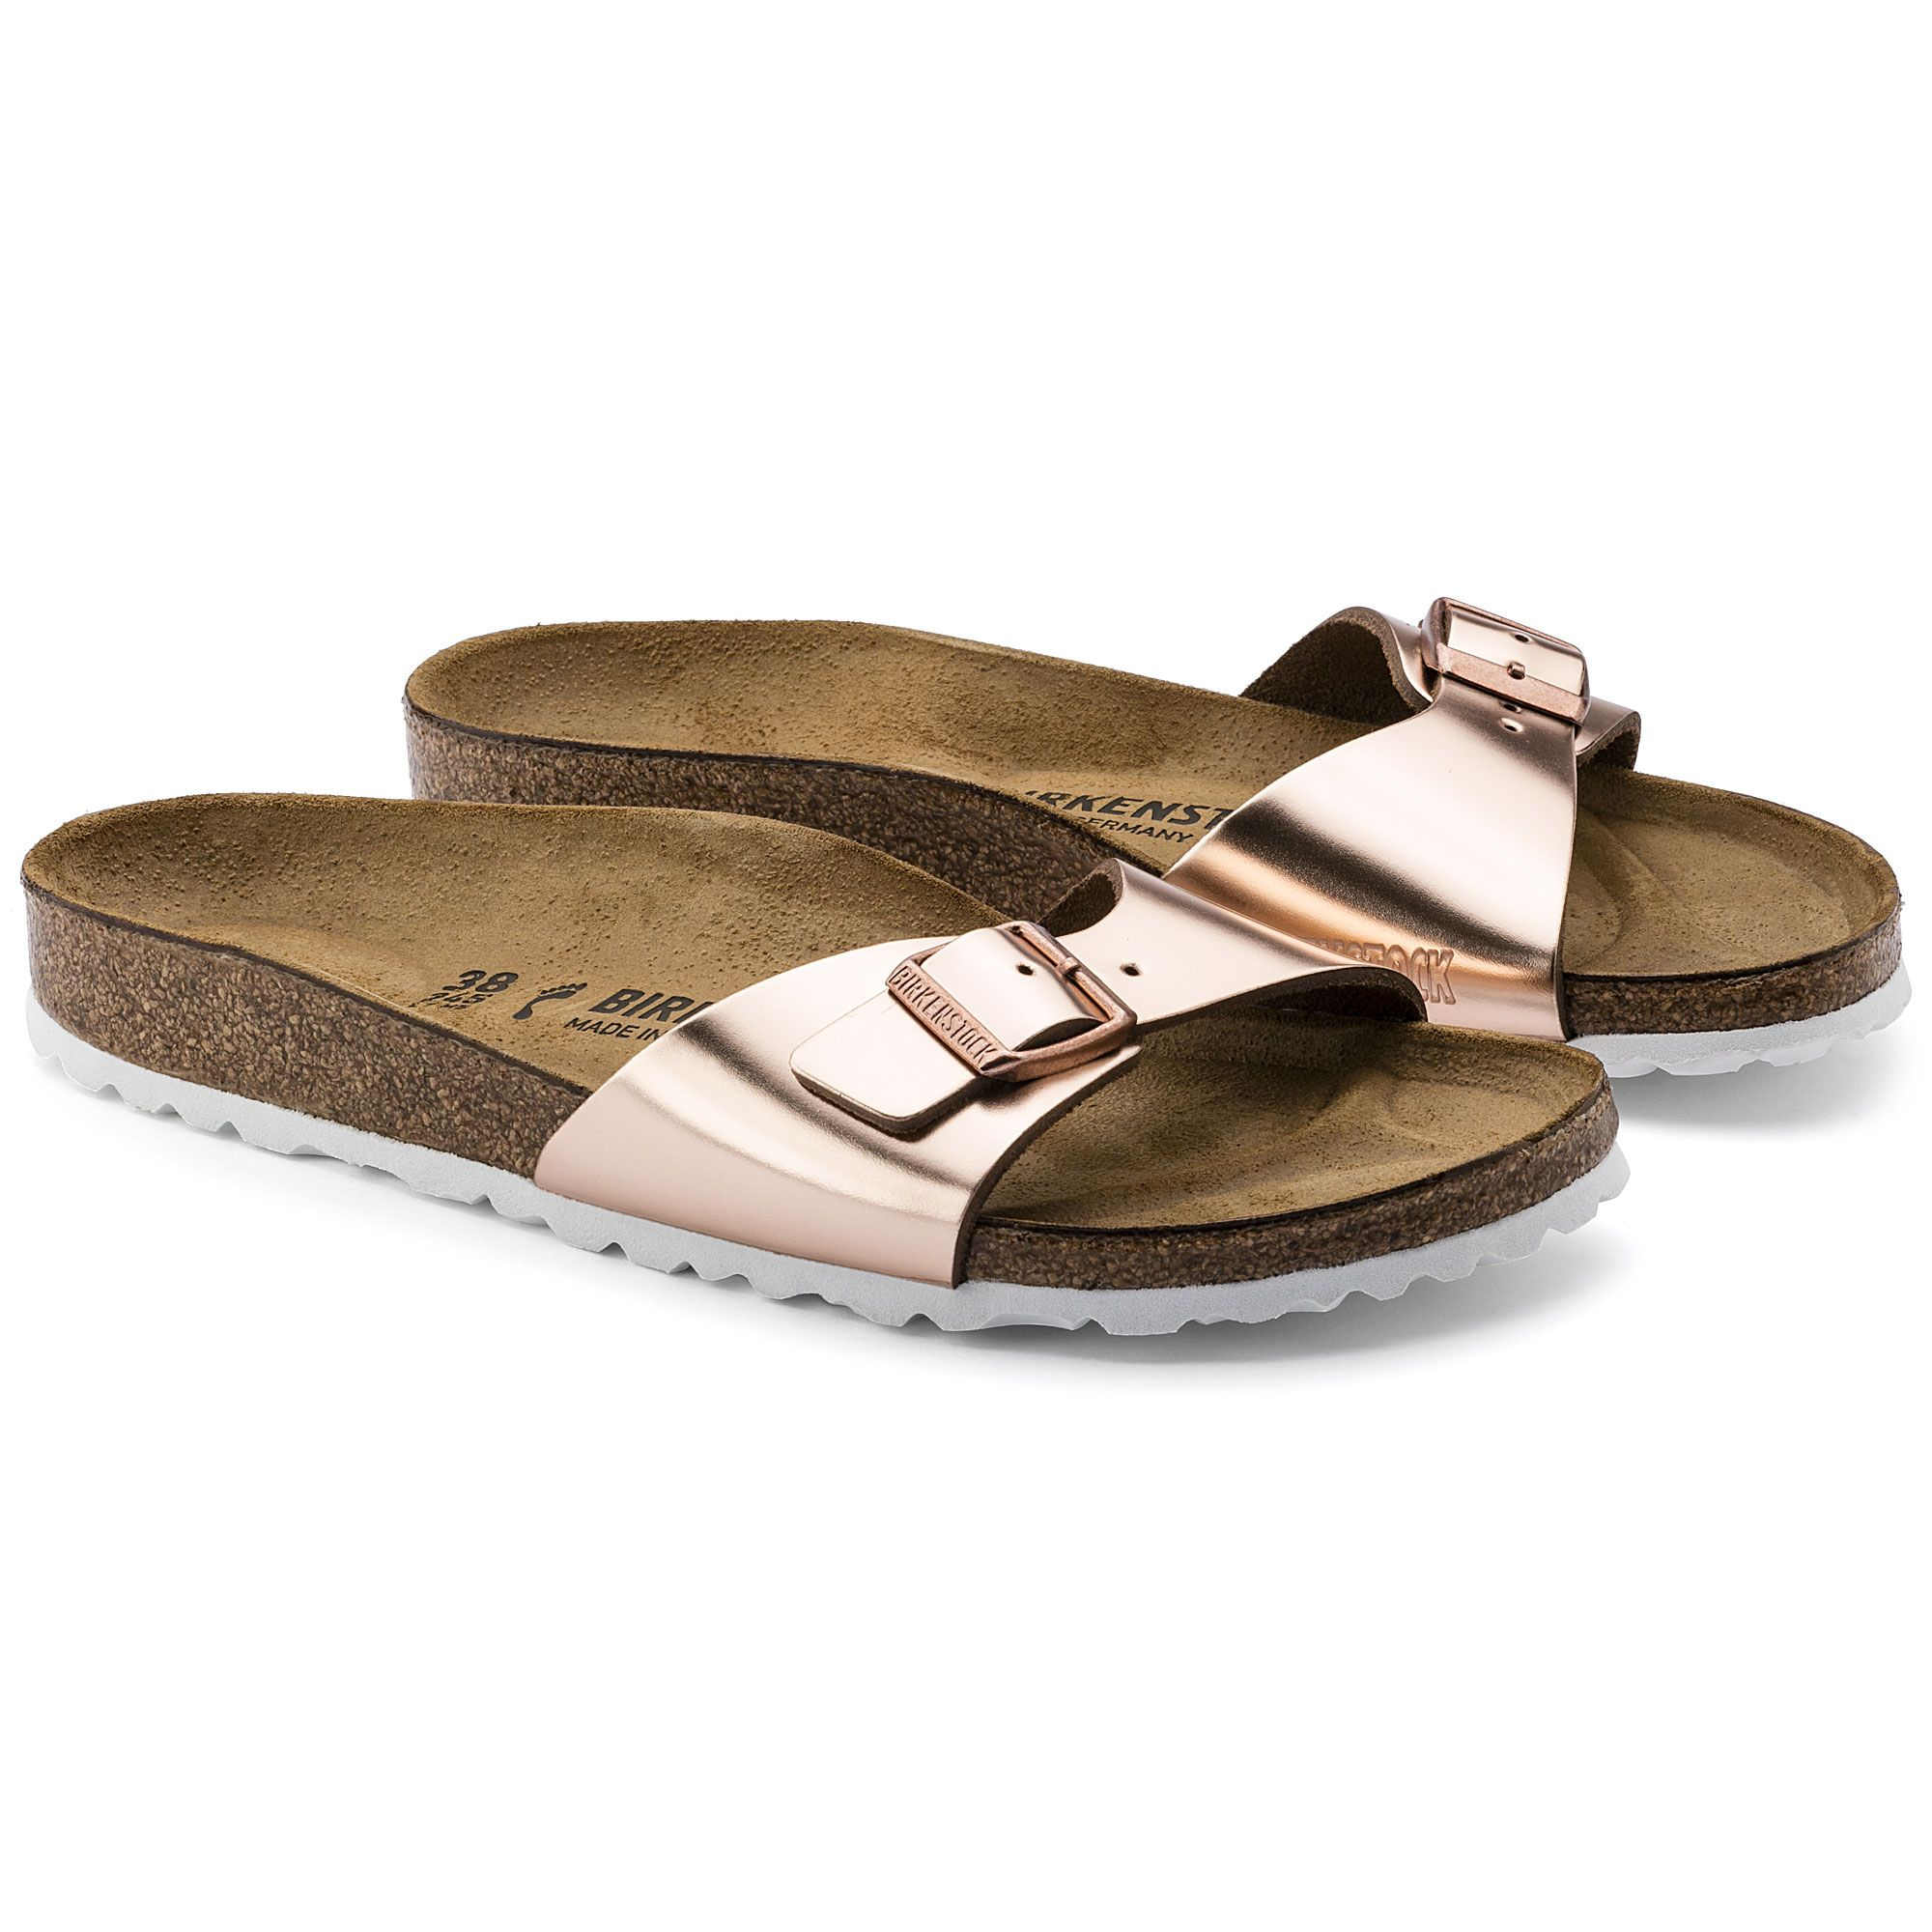 Madrid Leather Metallic Copper | Schuhe, Birkenstock madrid